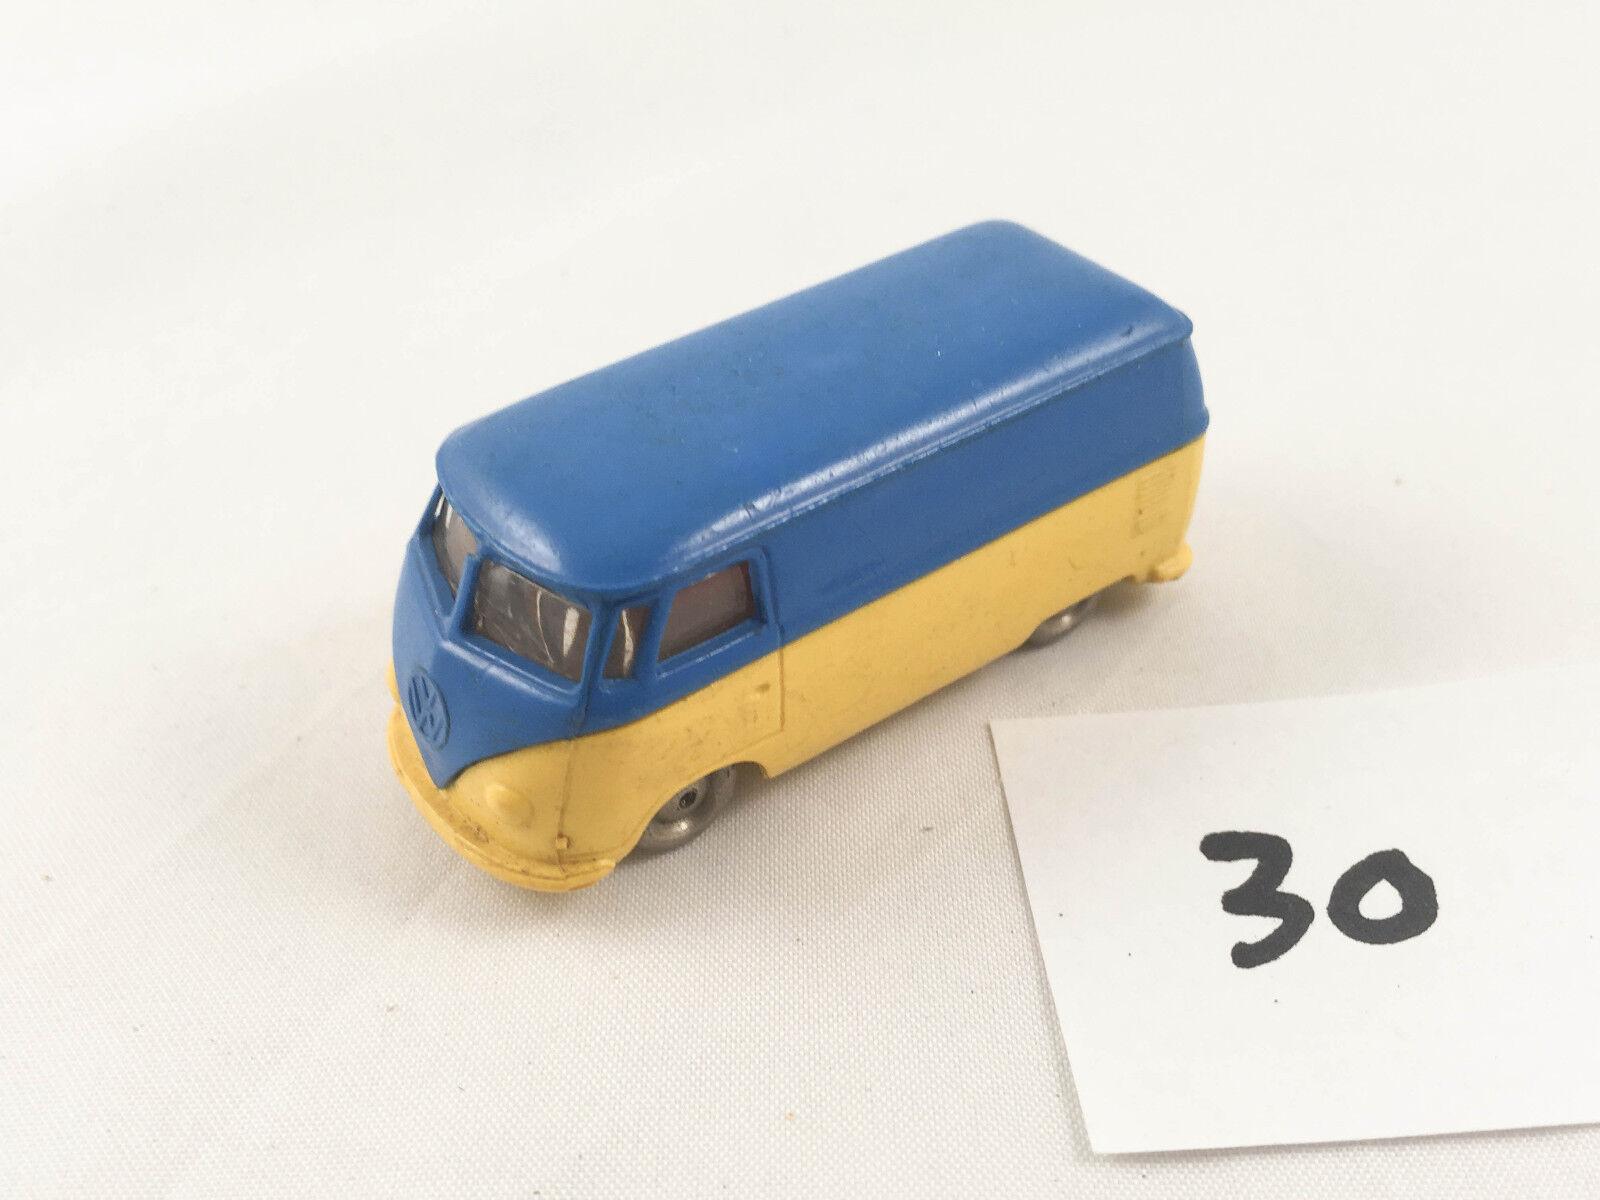 EXTREMELY RARE VINTAGE LEGO VOLKSWAGEN VW SPLITSCREEN MICRO VAN 1 87 HO SCALE